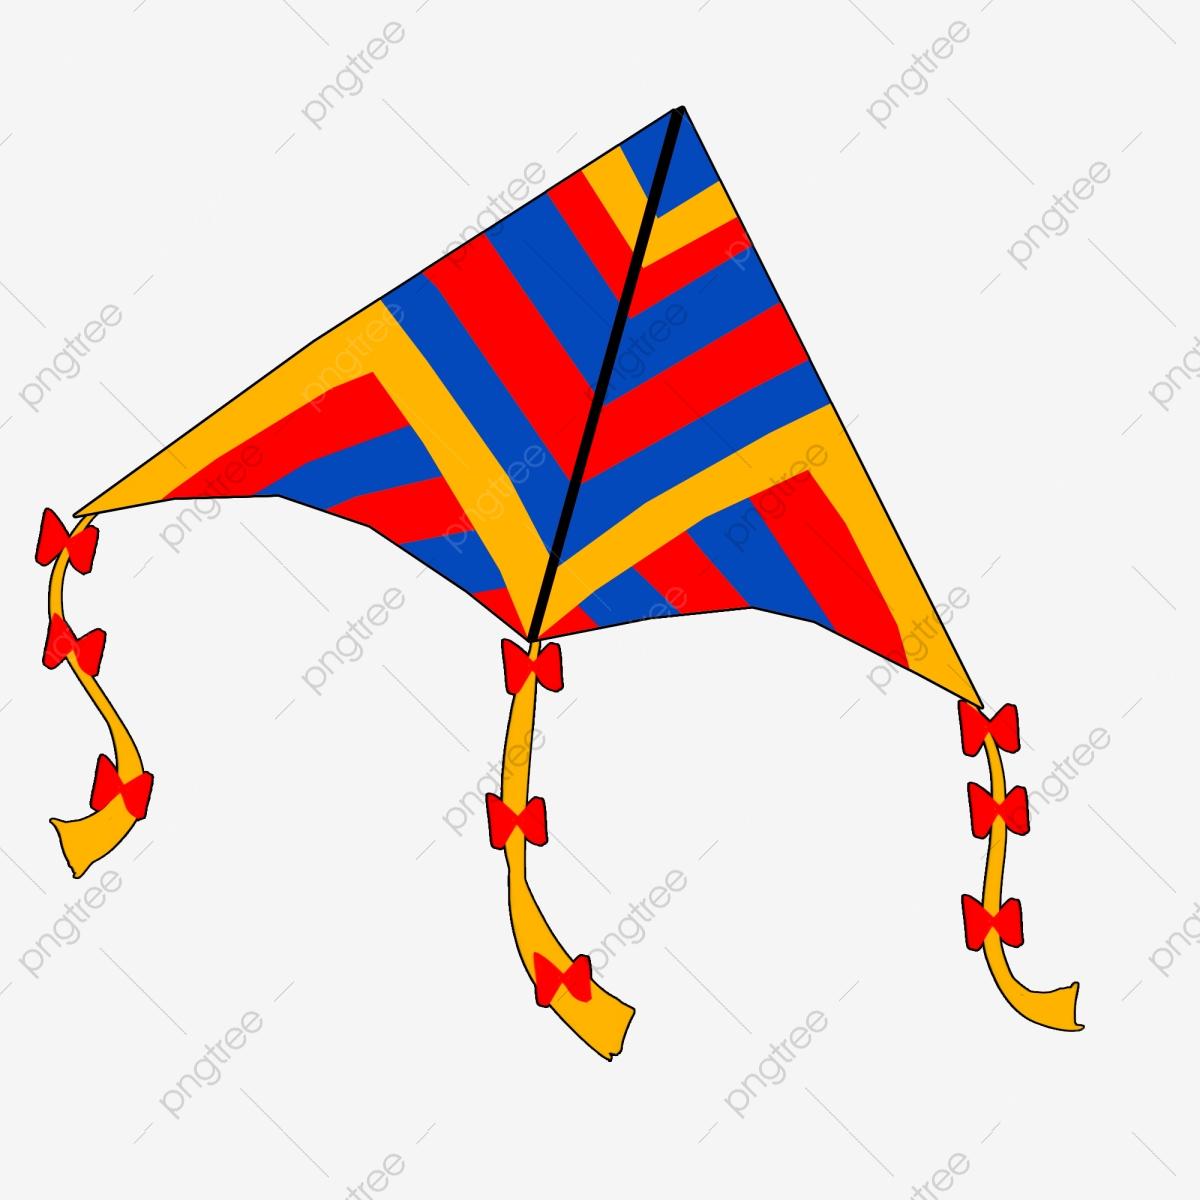 Beautiful Kite Colorful Kite Illustration Cartoon Kite Red ... clipart freeuse